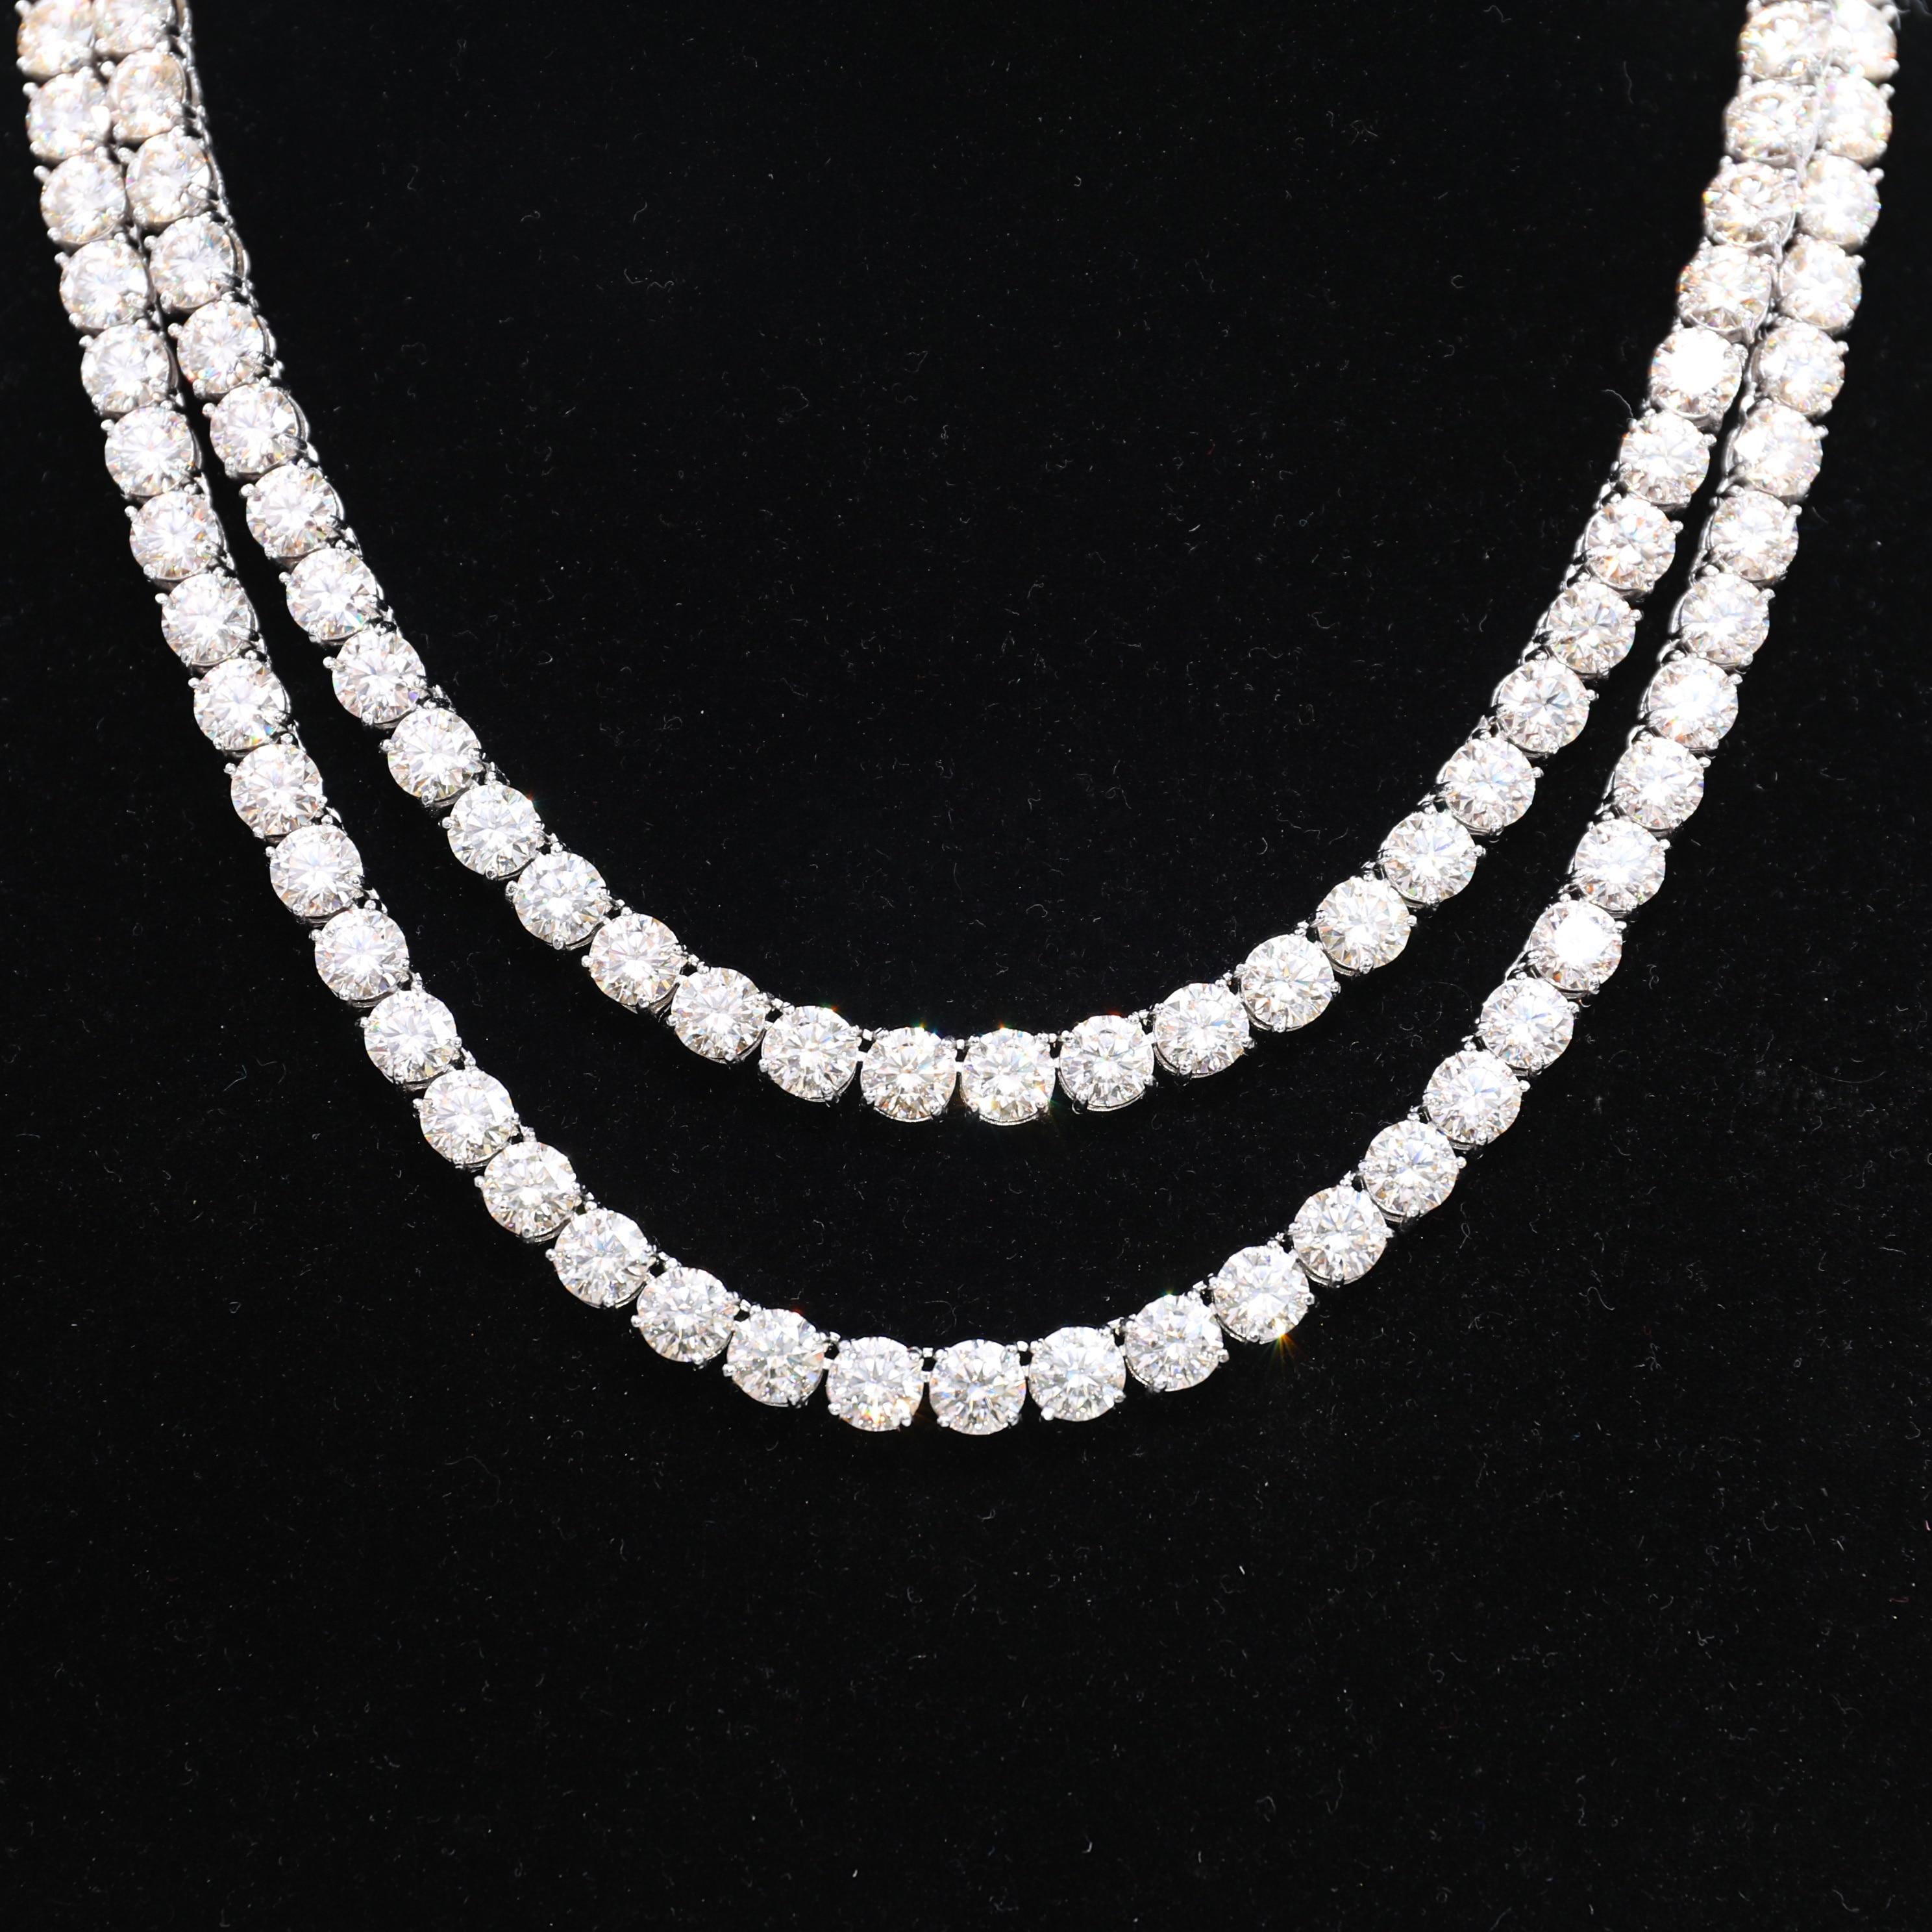 OTIY925 Sterling Silver 1 Carat 4mm Necklace Choker VVS1 Moissanite Tennis Chain  Necklace Women